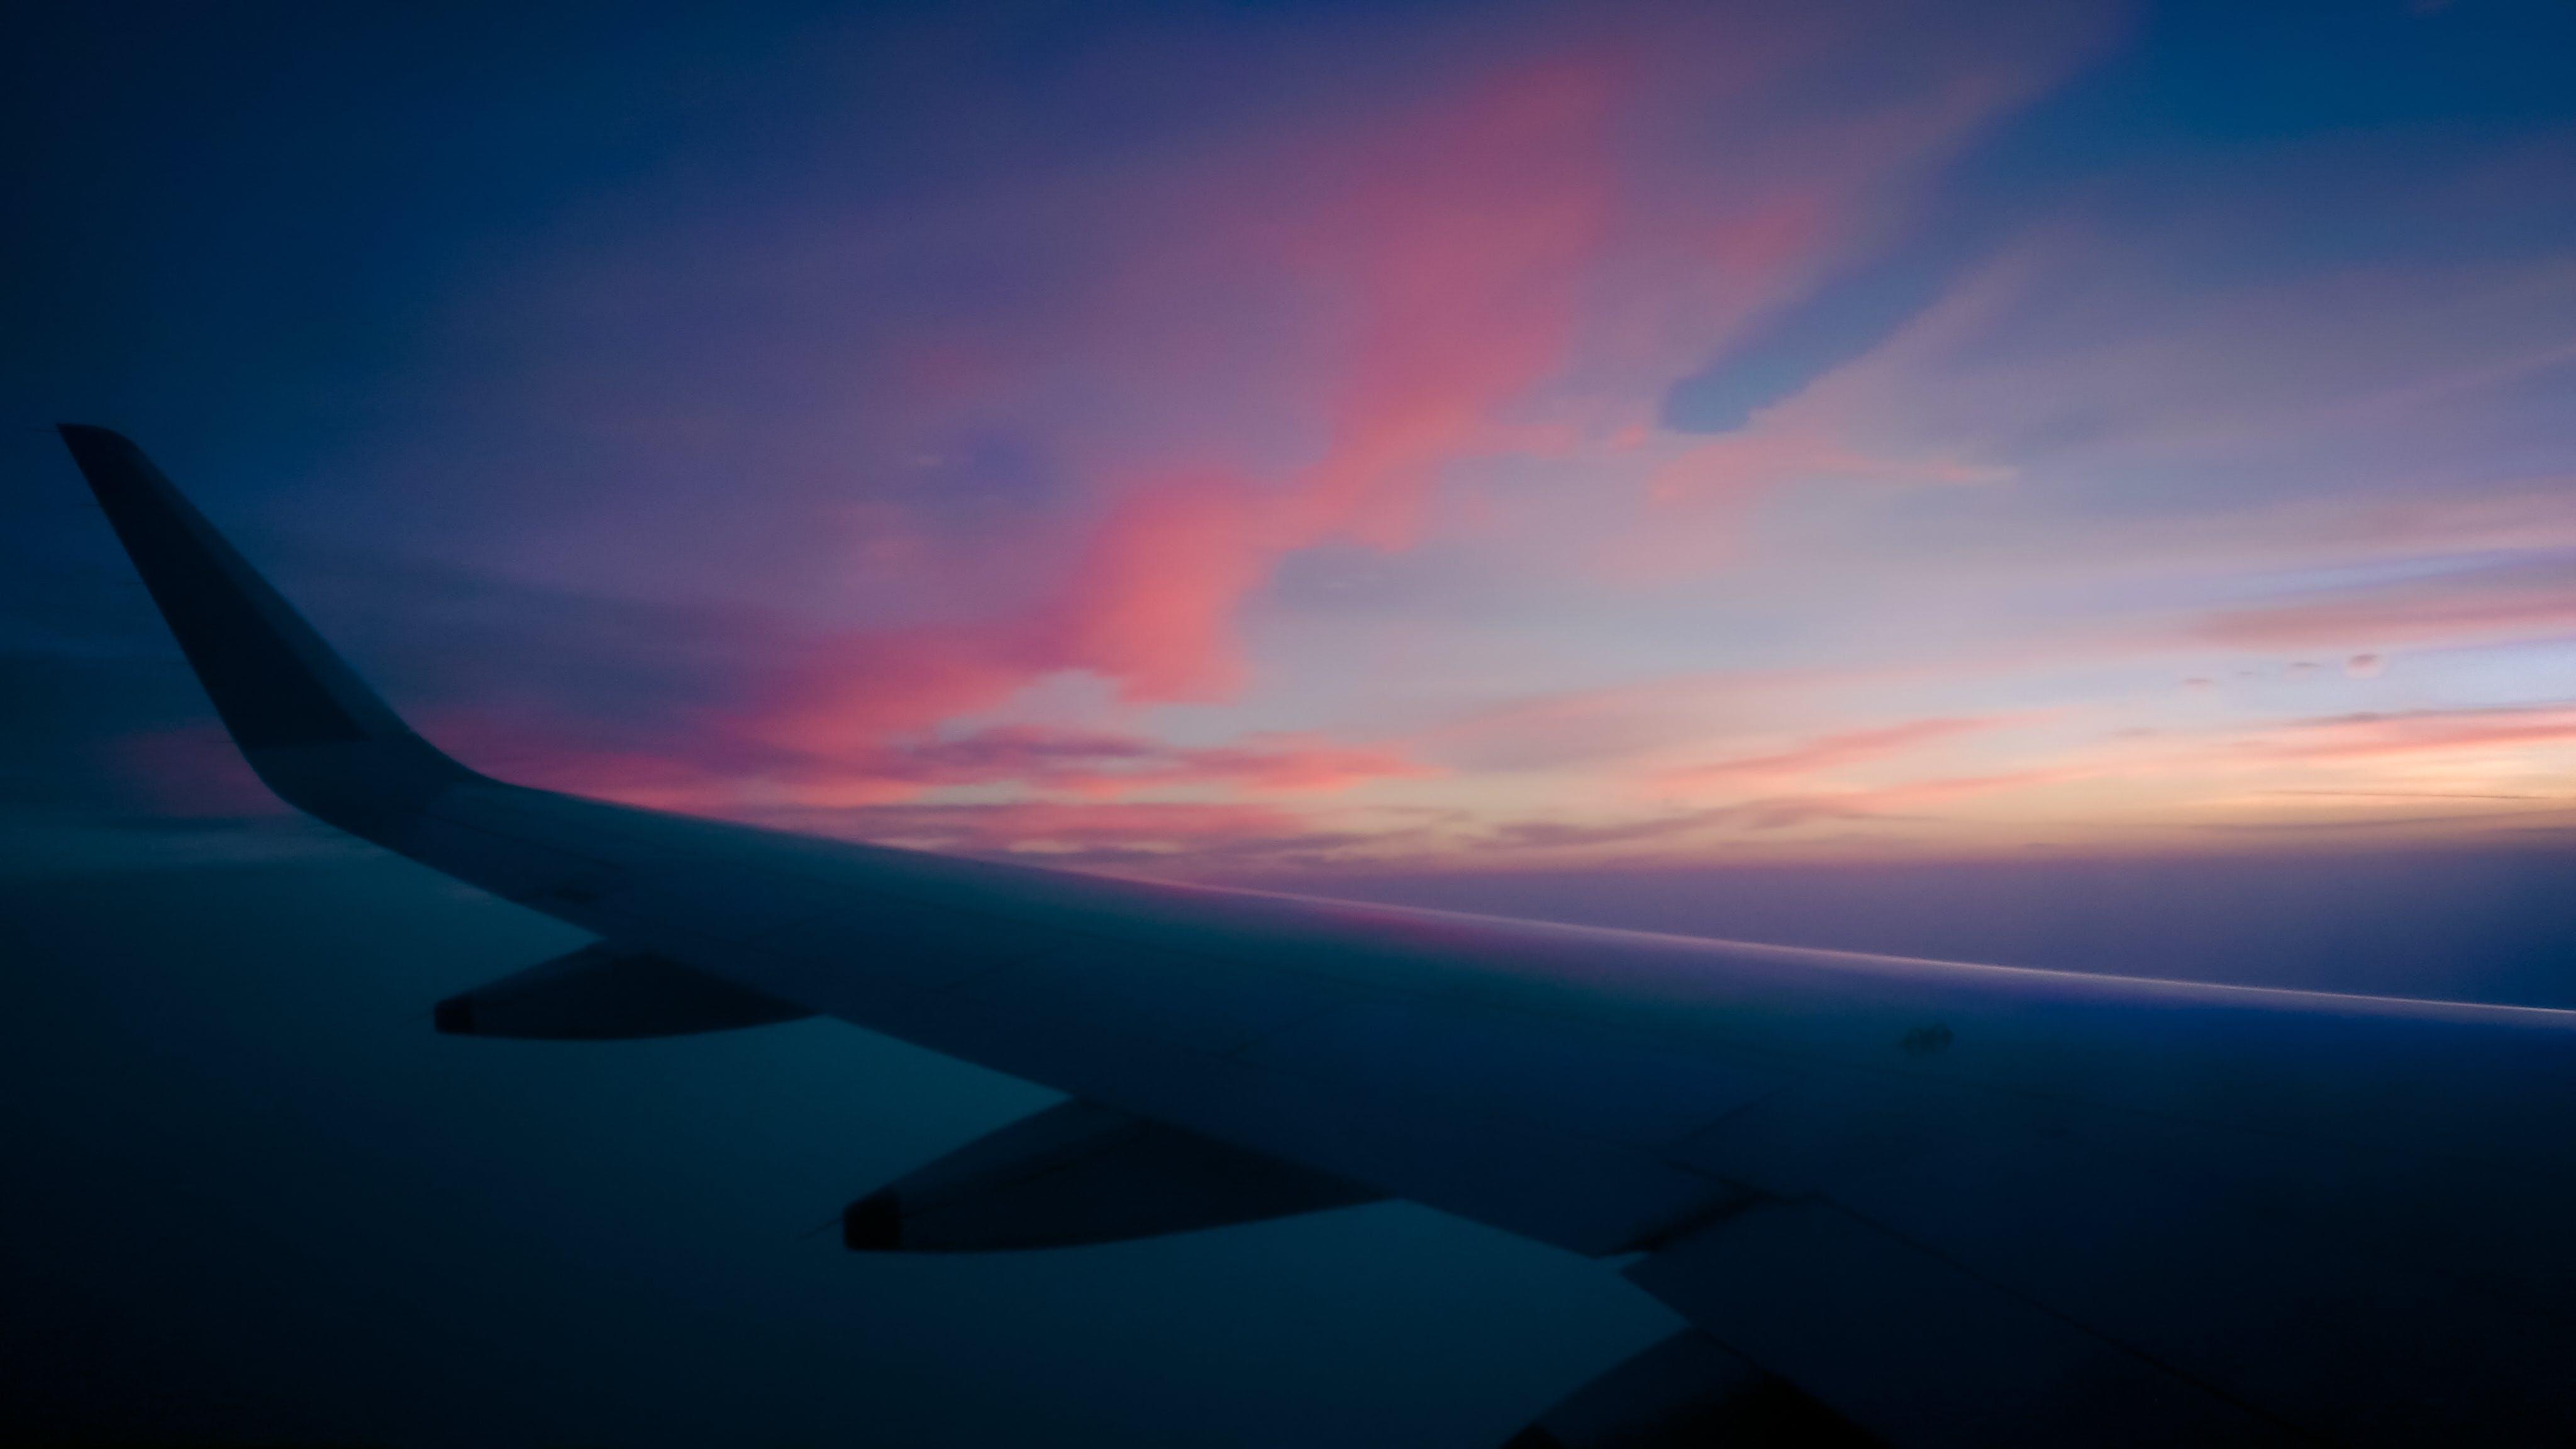 Free stock photo of aeroplane, dramatic sky, fly, orange sky